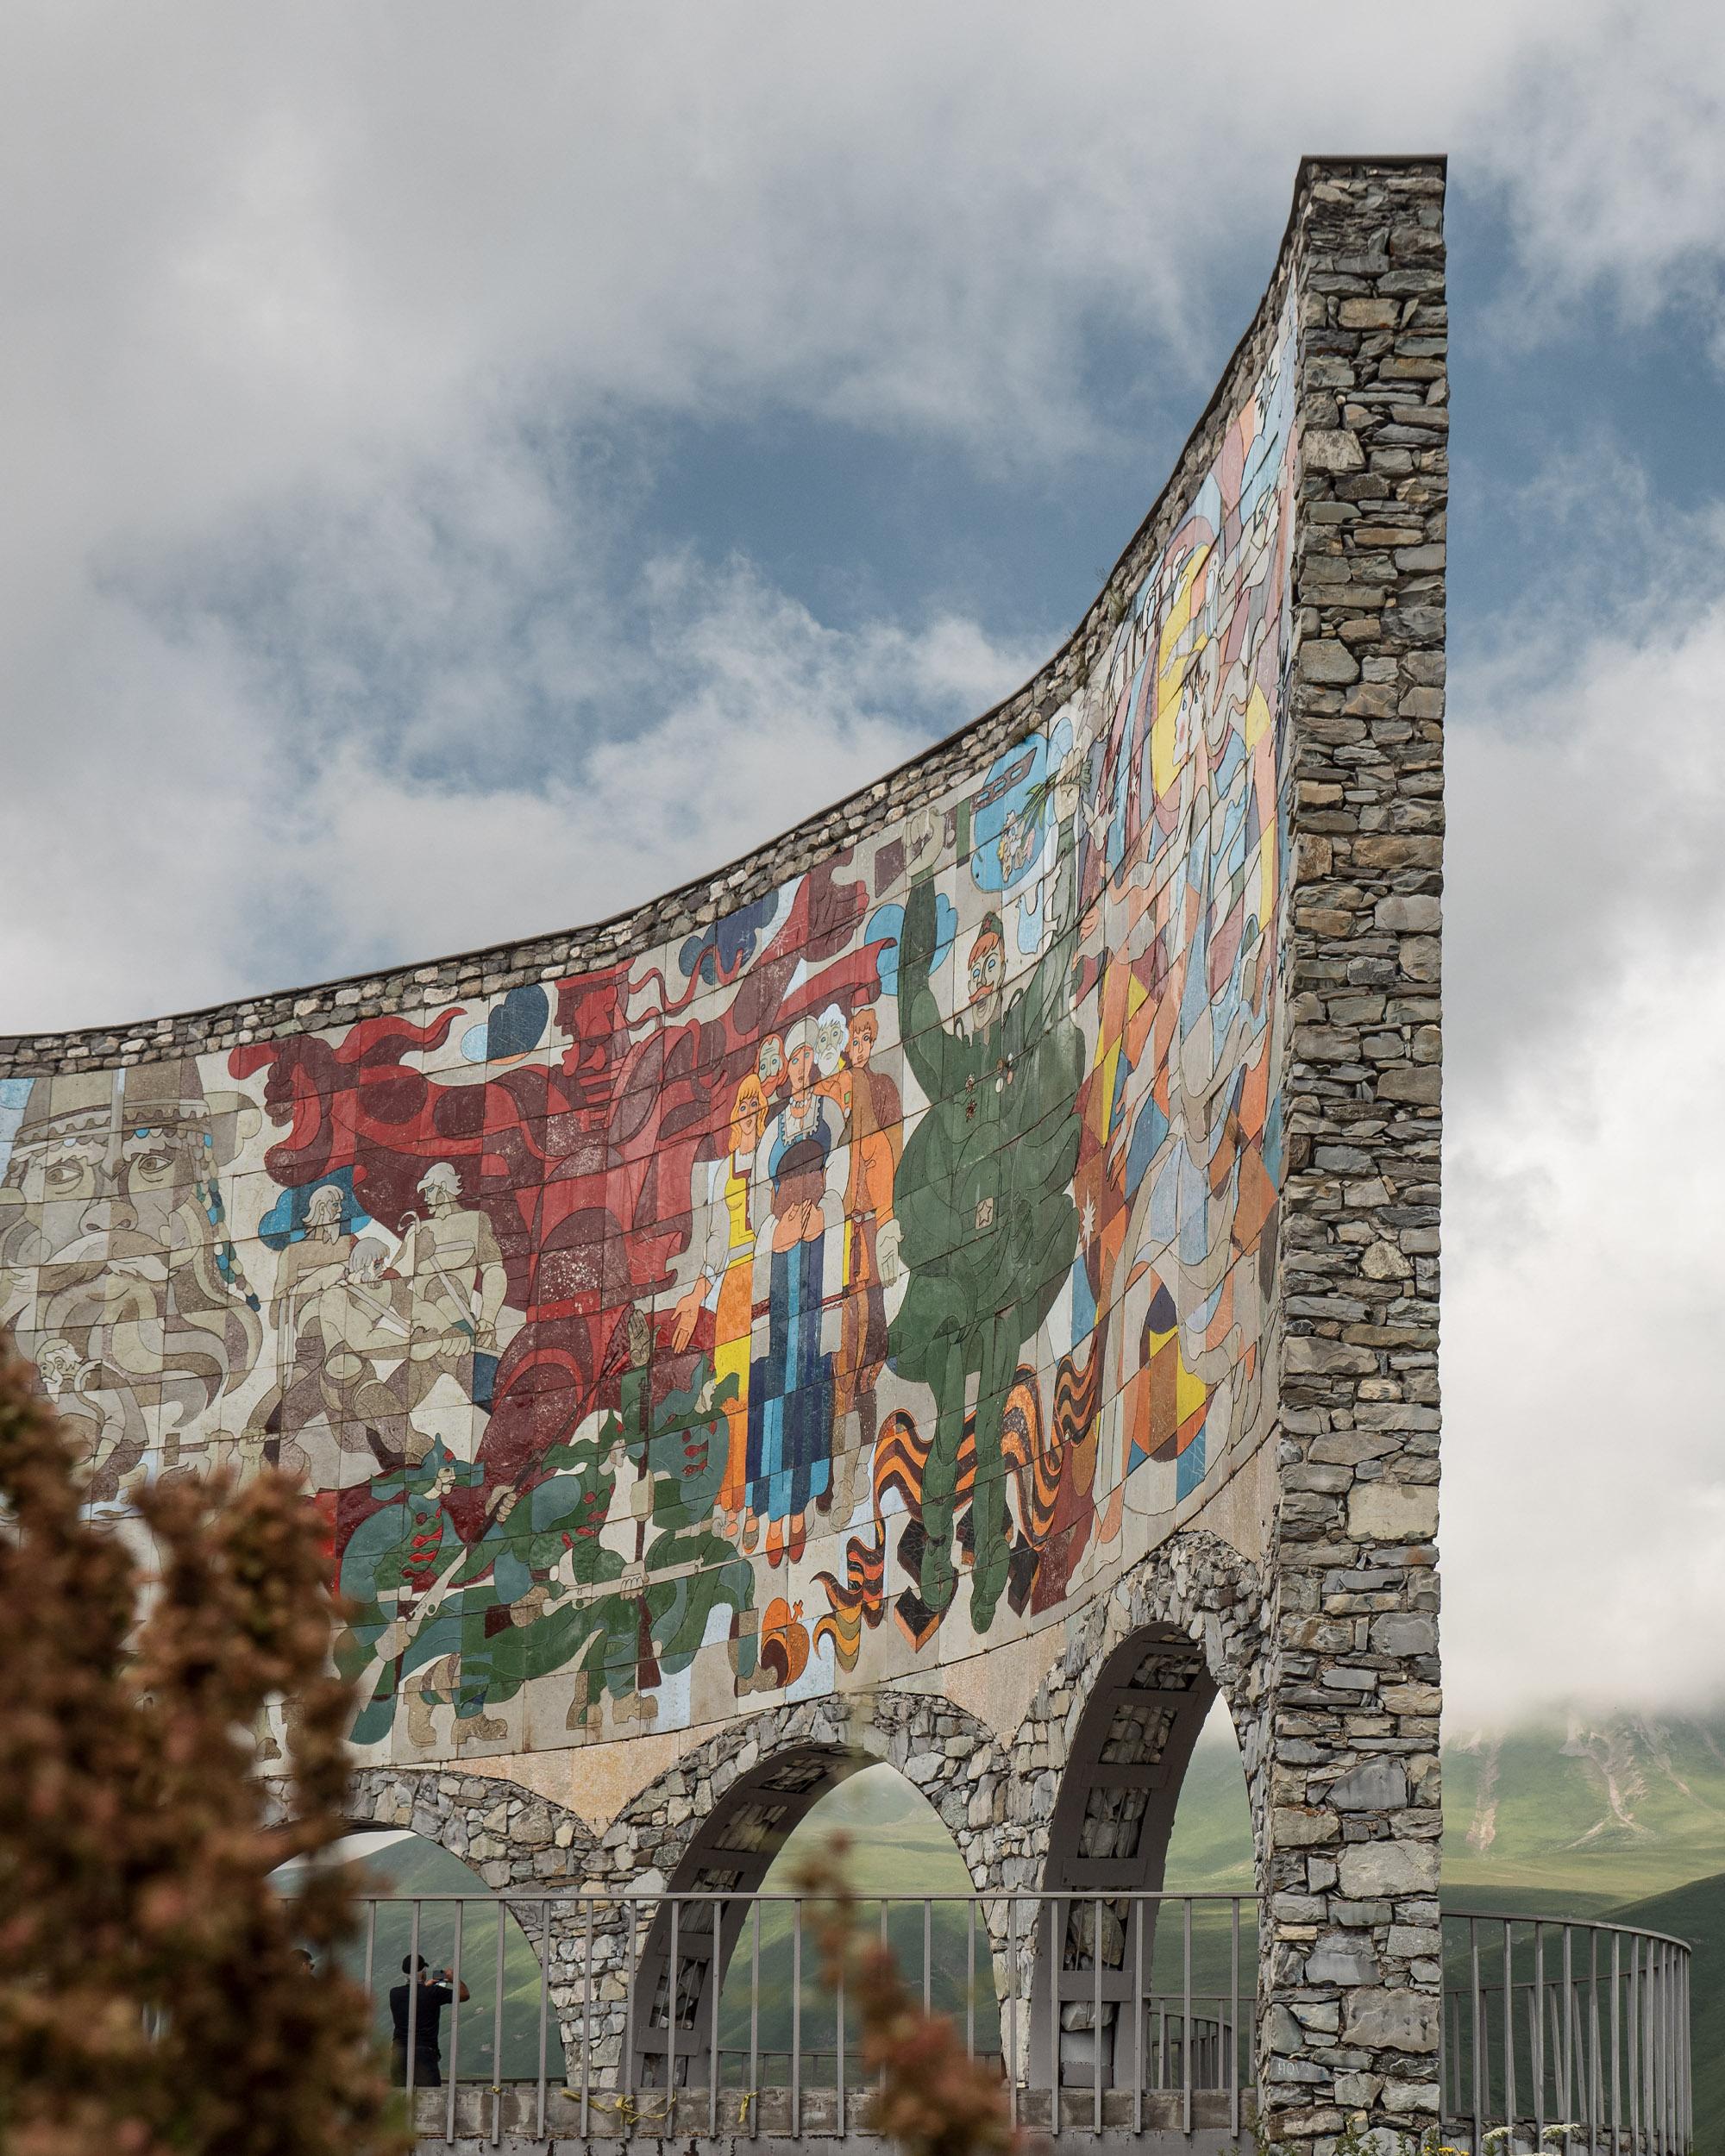 Russia Georgia Friendship Monument in Kazbegi, Georgia